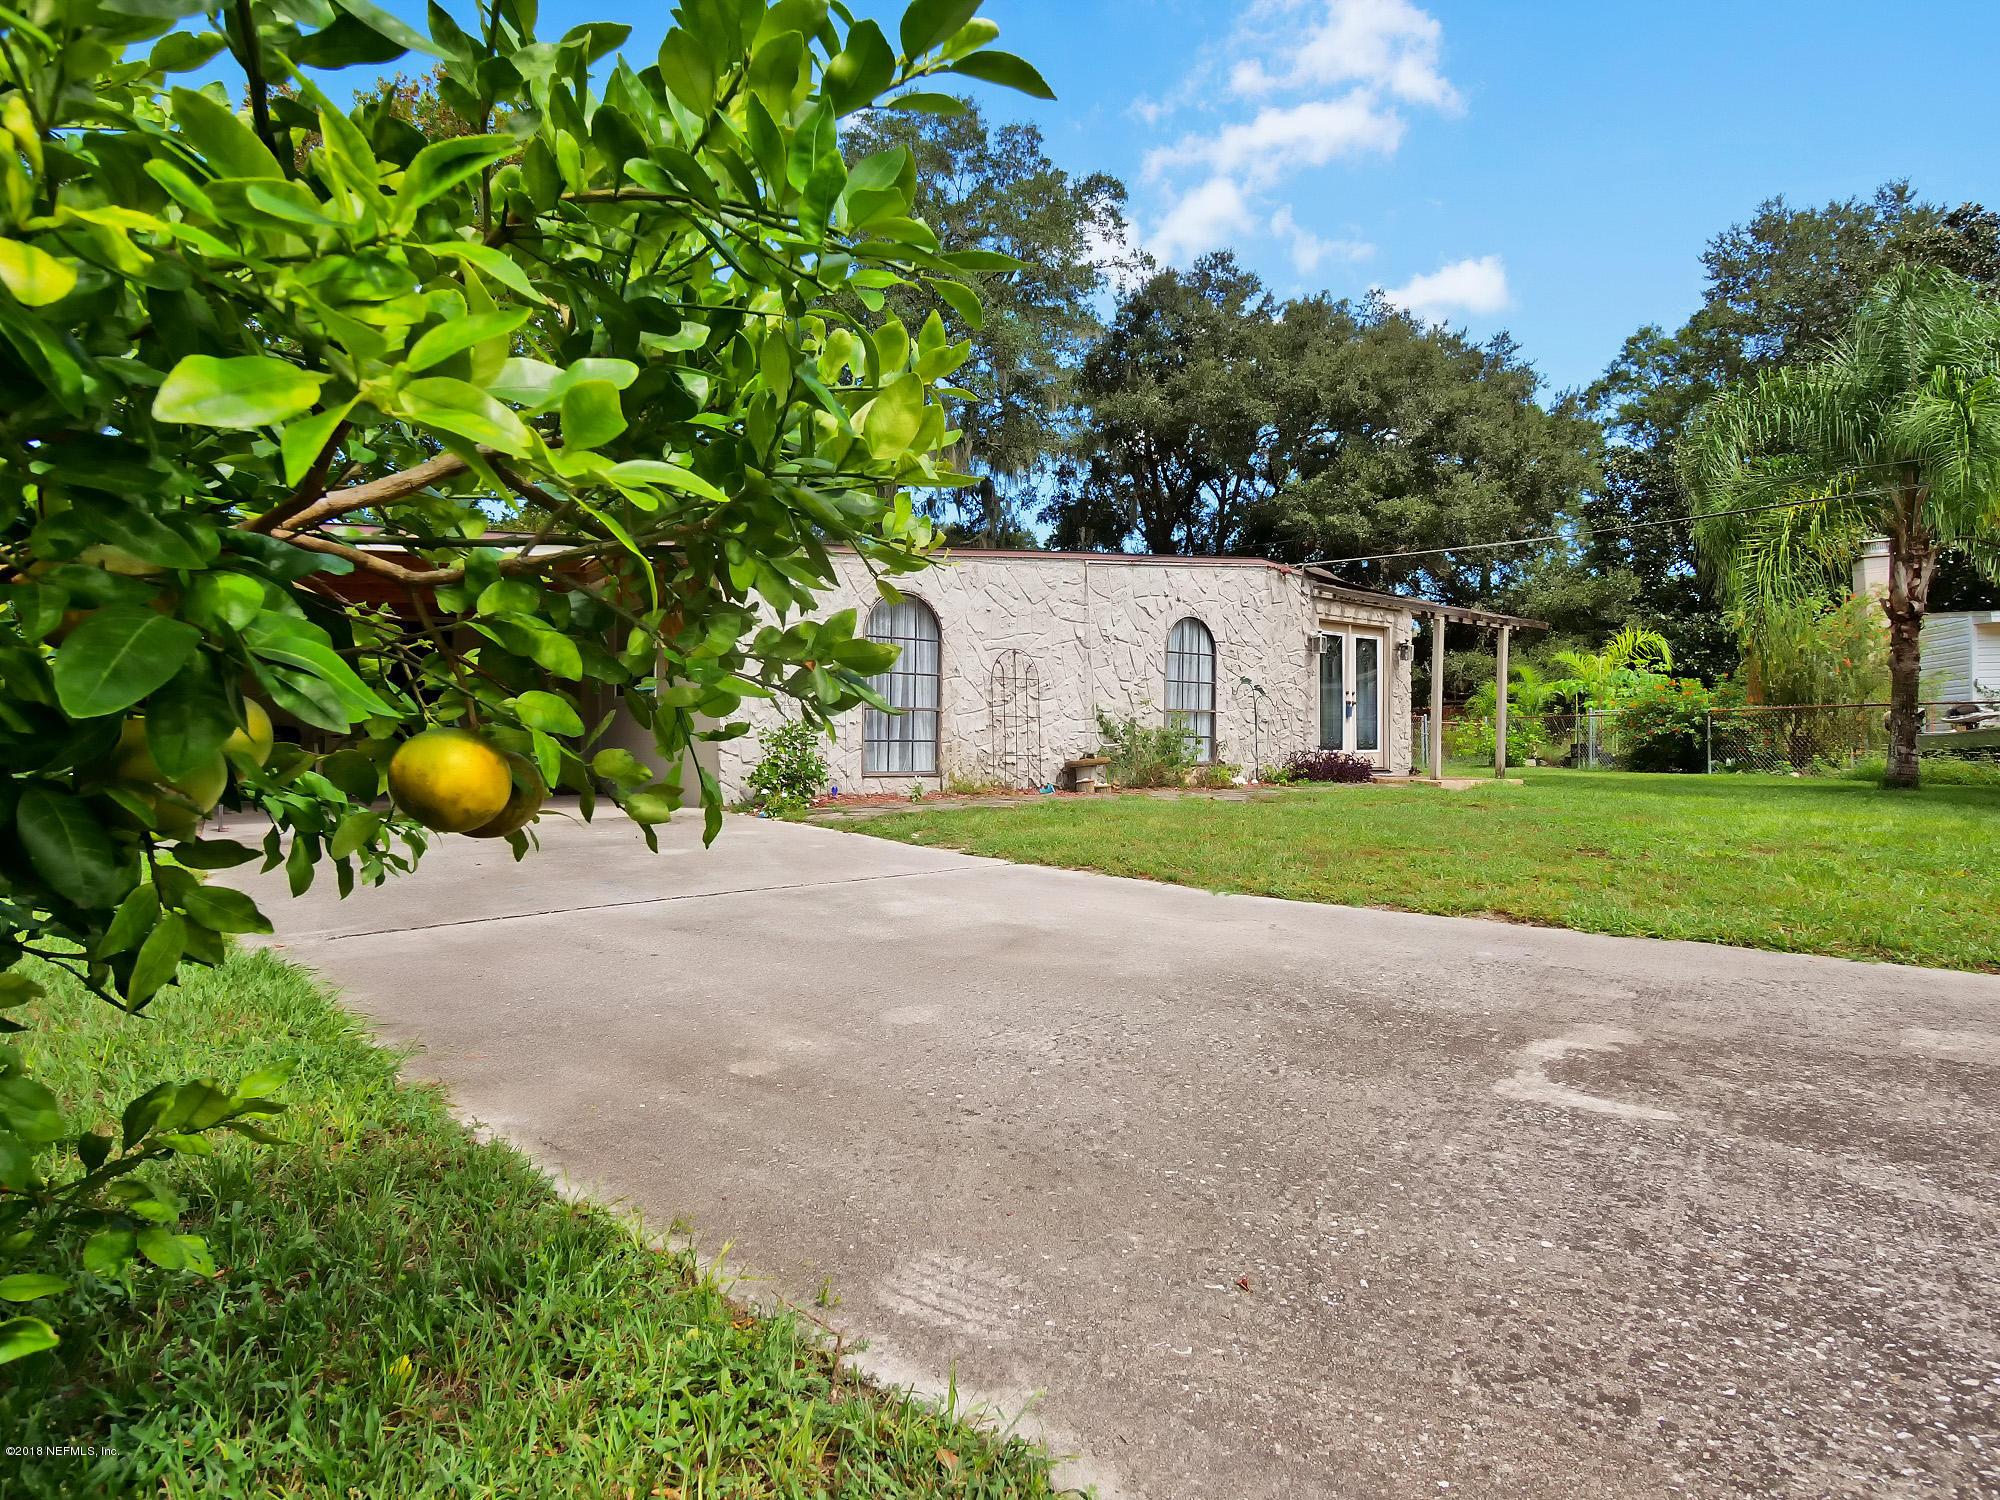 1909 CORTEZ, JACKSONVILLE, FLORIDA 32246, 3 Bedrooms Bedrooms, ,1 BathroomBathrooms,Residential - single family,For sale,CORTEZ,959653